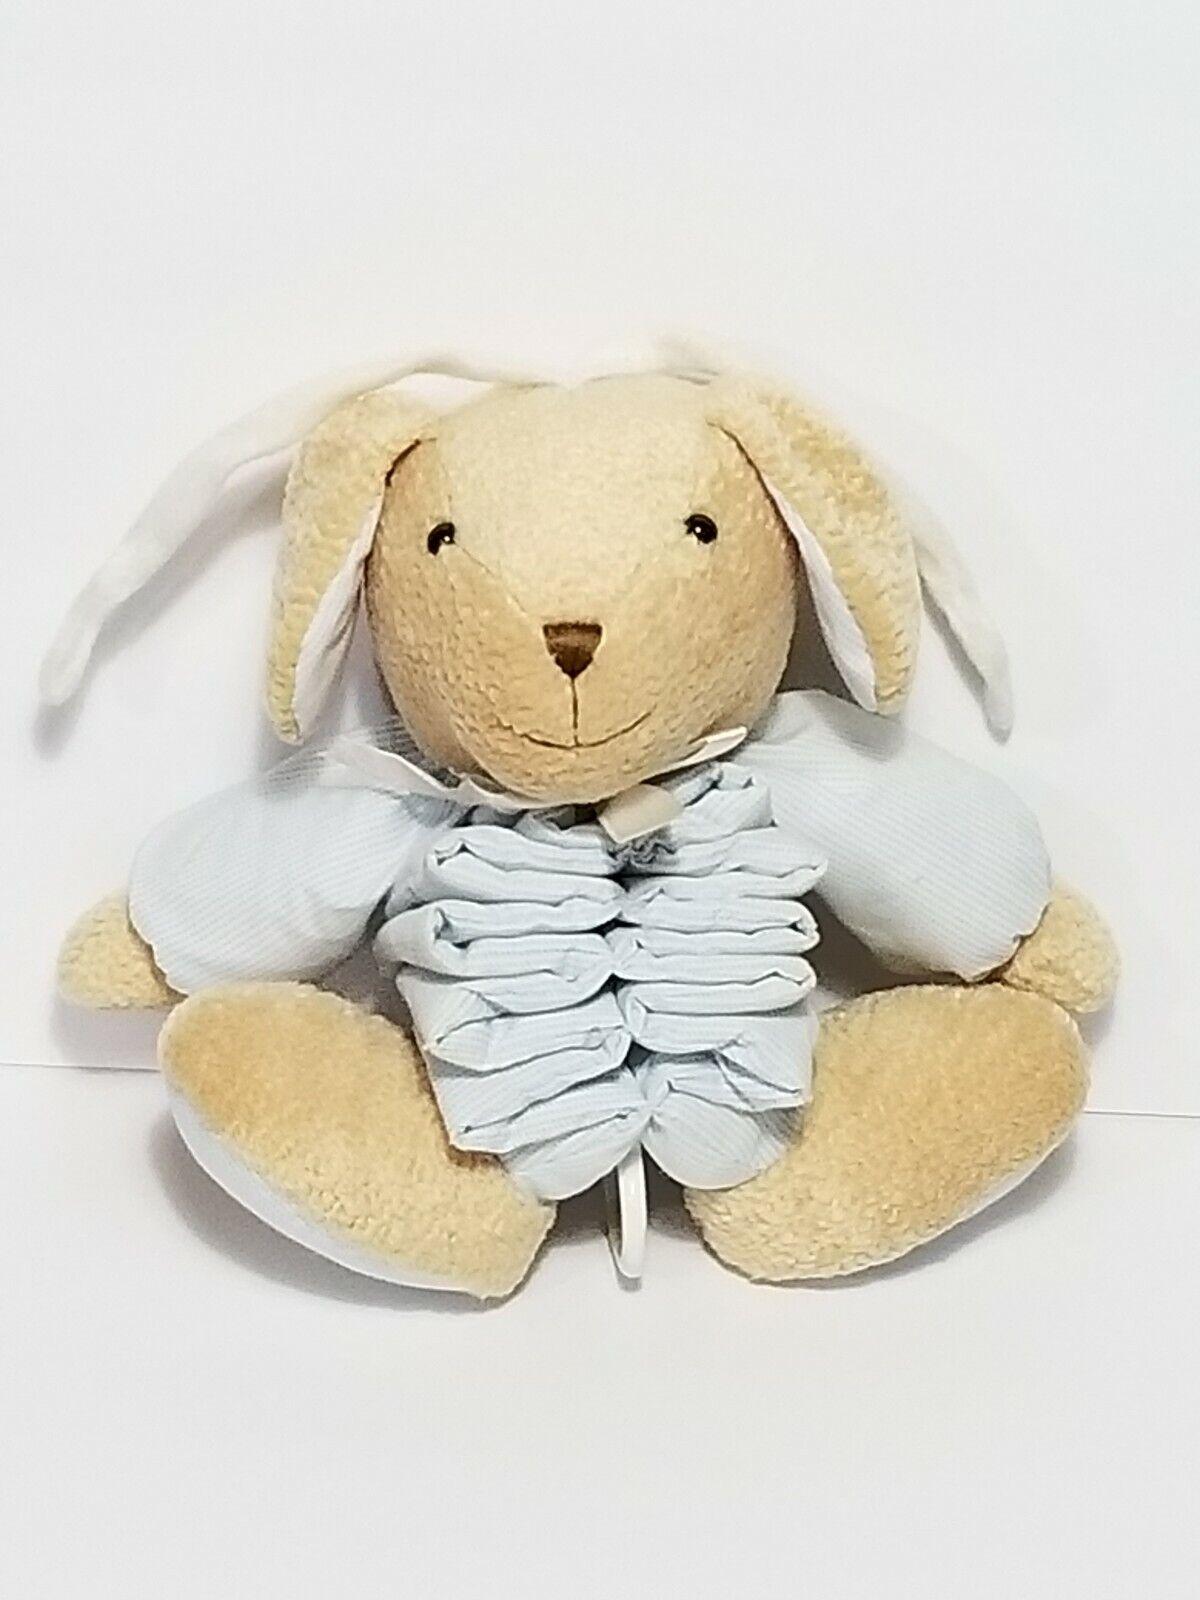 Carters Just One Year Bunny Rabbit Musical Pull Toy Blau Accordion Plush Stuffed